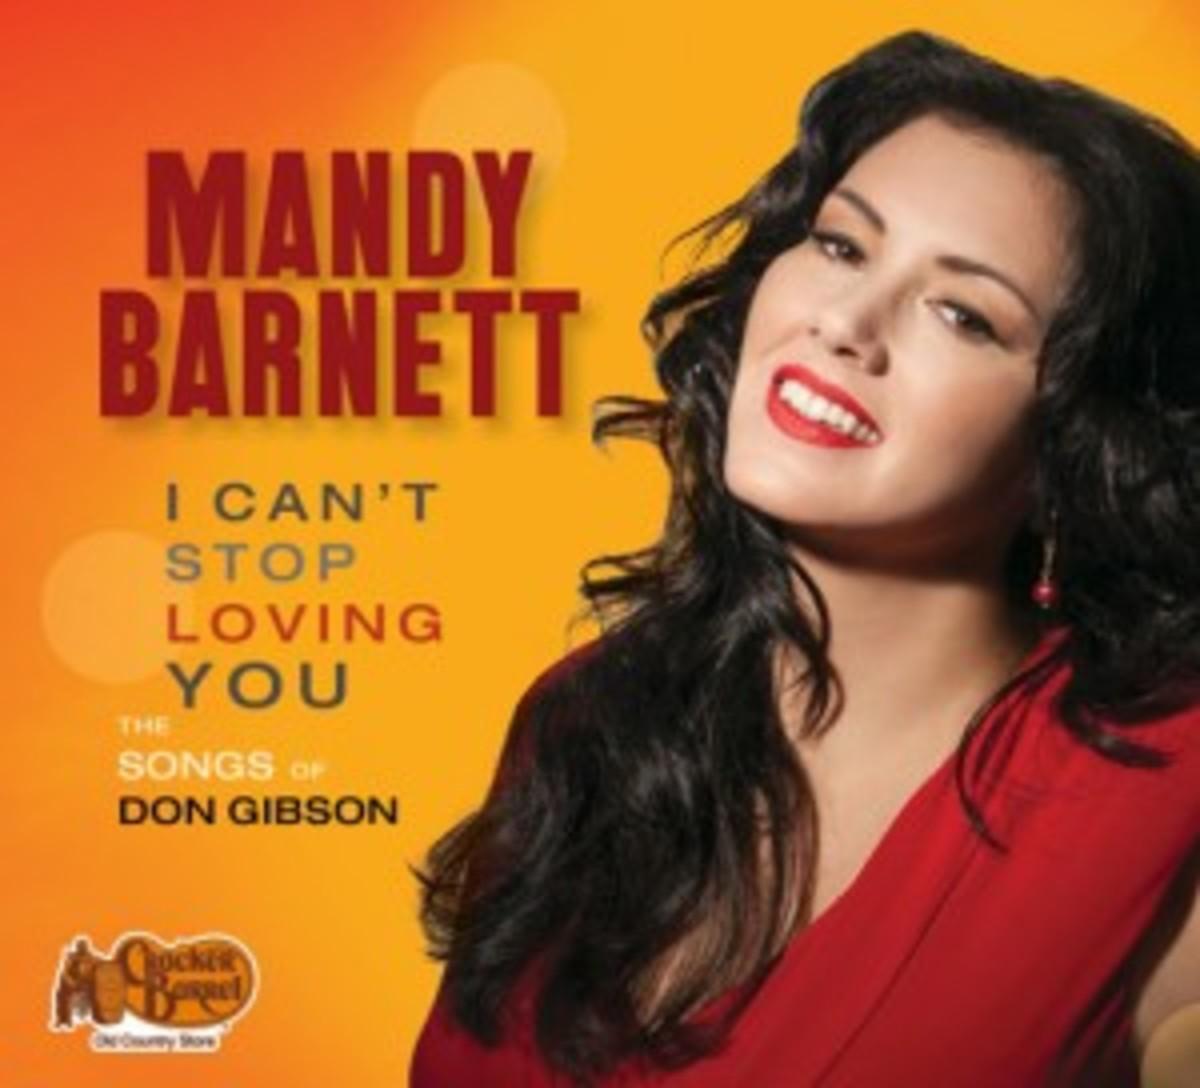 Mandy Barnett I Can't Stop Loving You